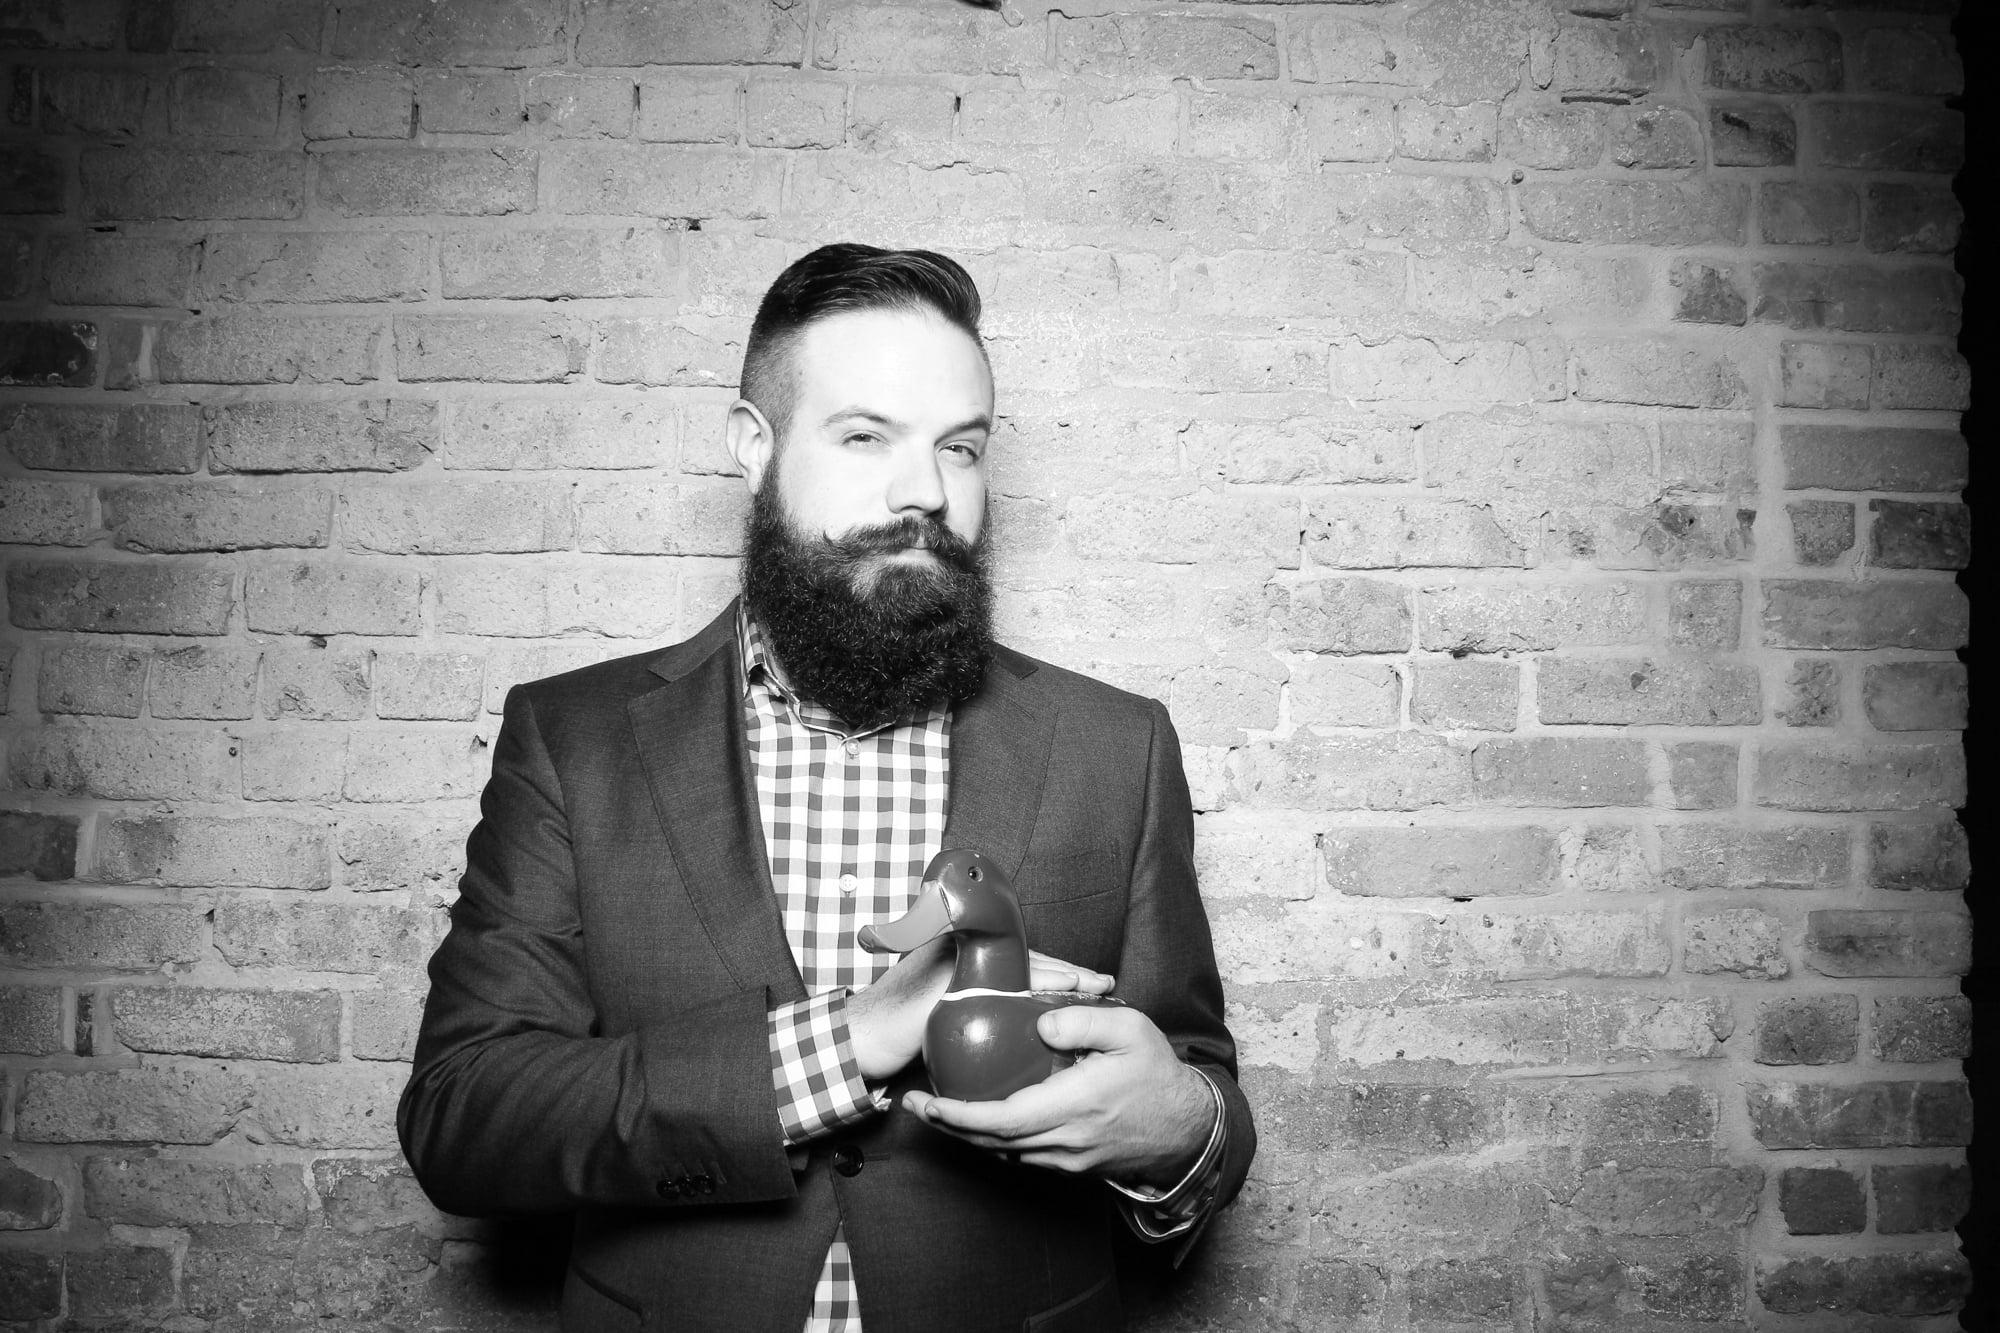 Bearded man holding wooden duck. Digital photograph ca. 2016.